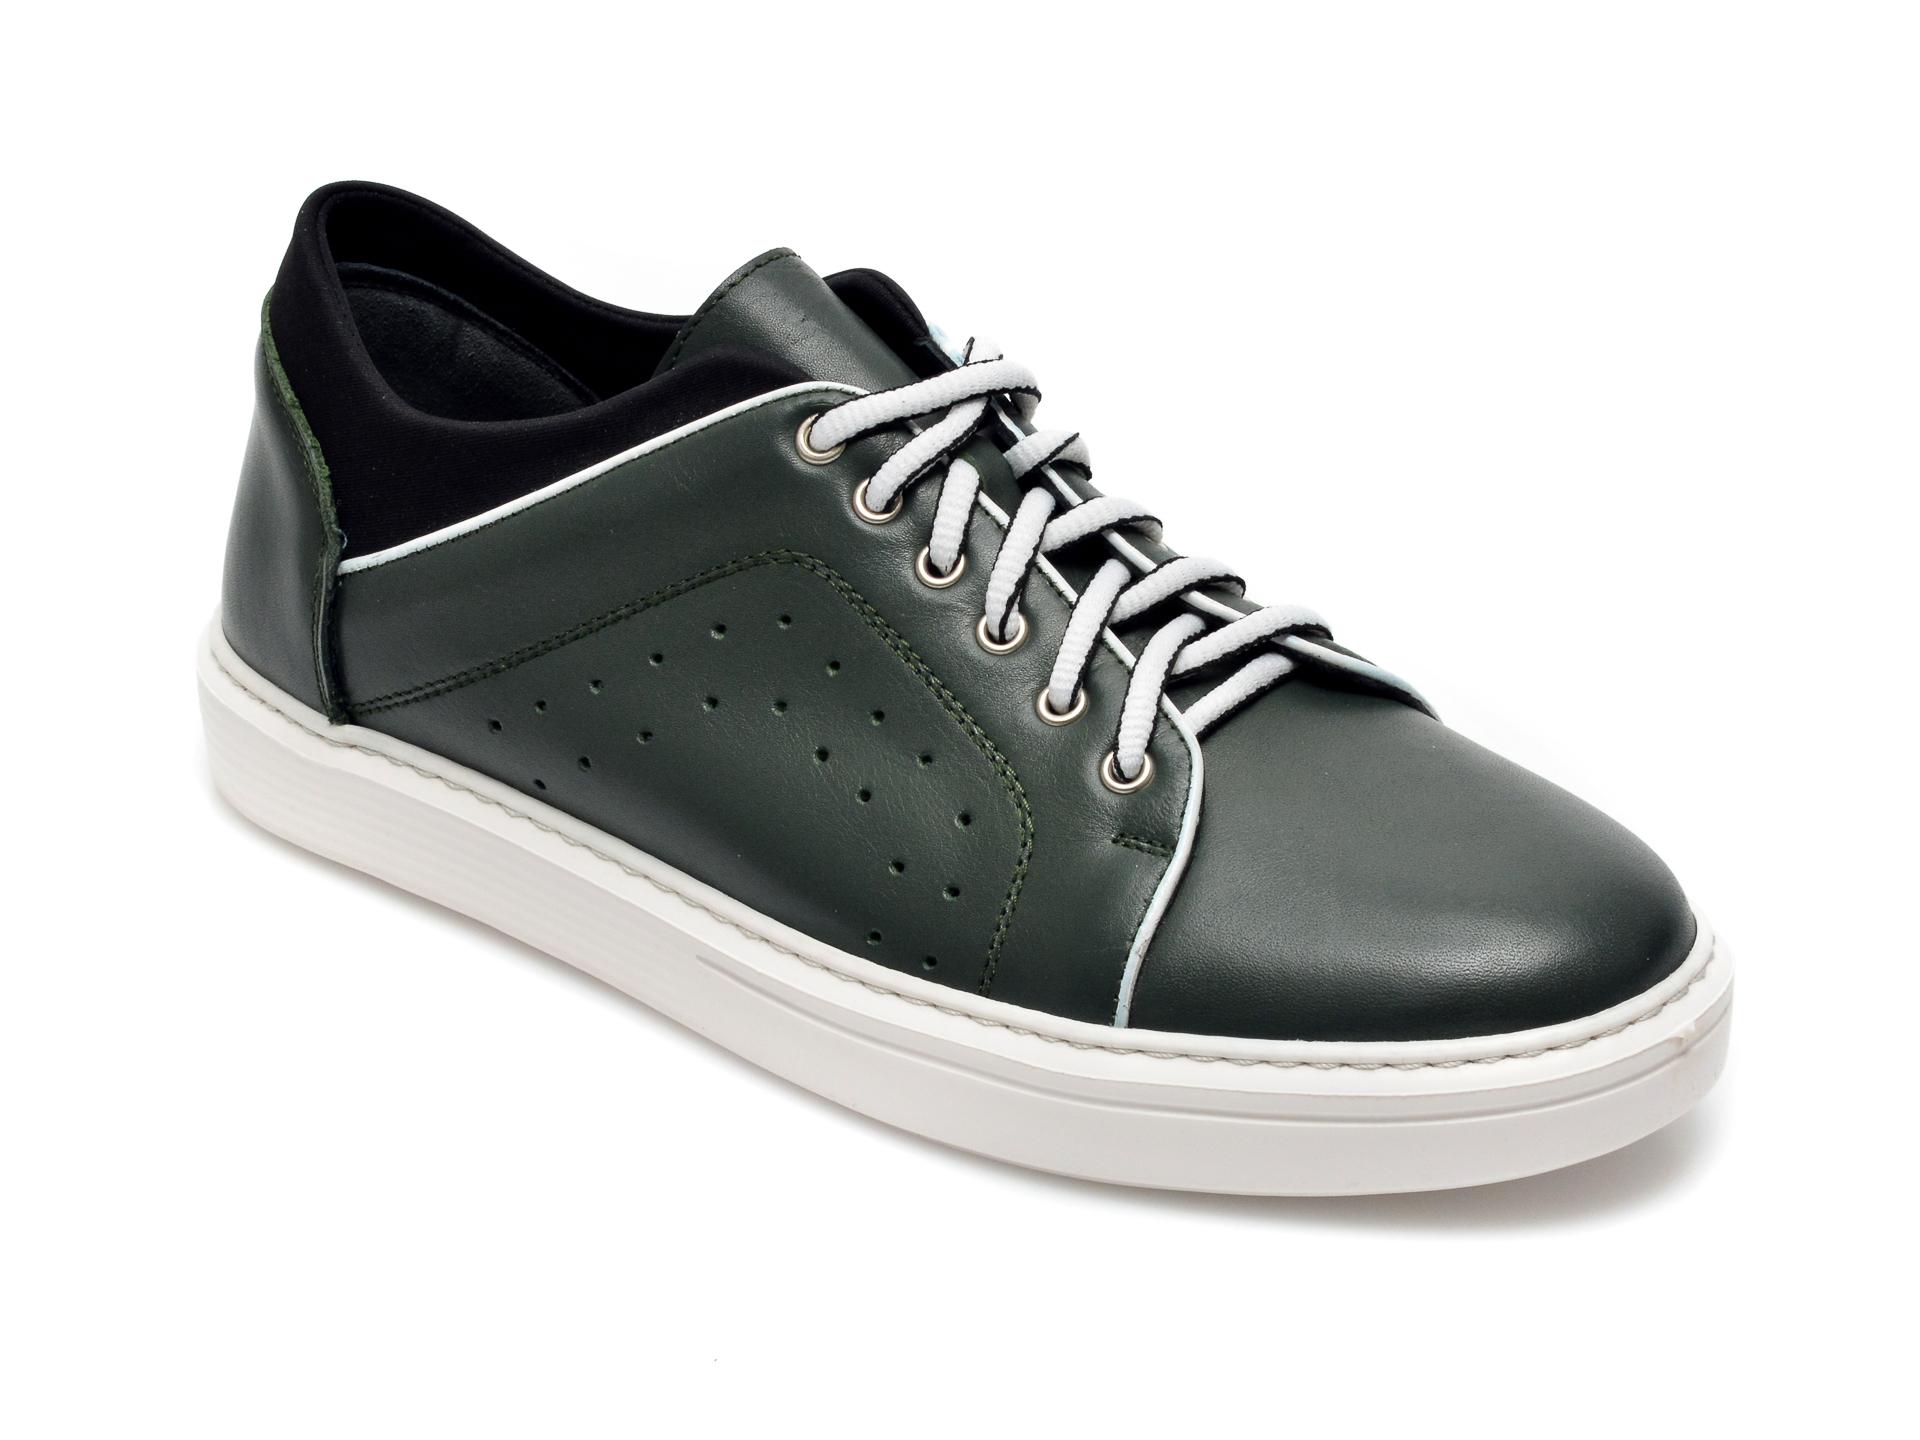 Pantofi Otter Verzi, 959, Din Piele Naturala